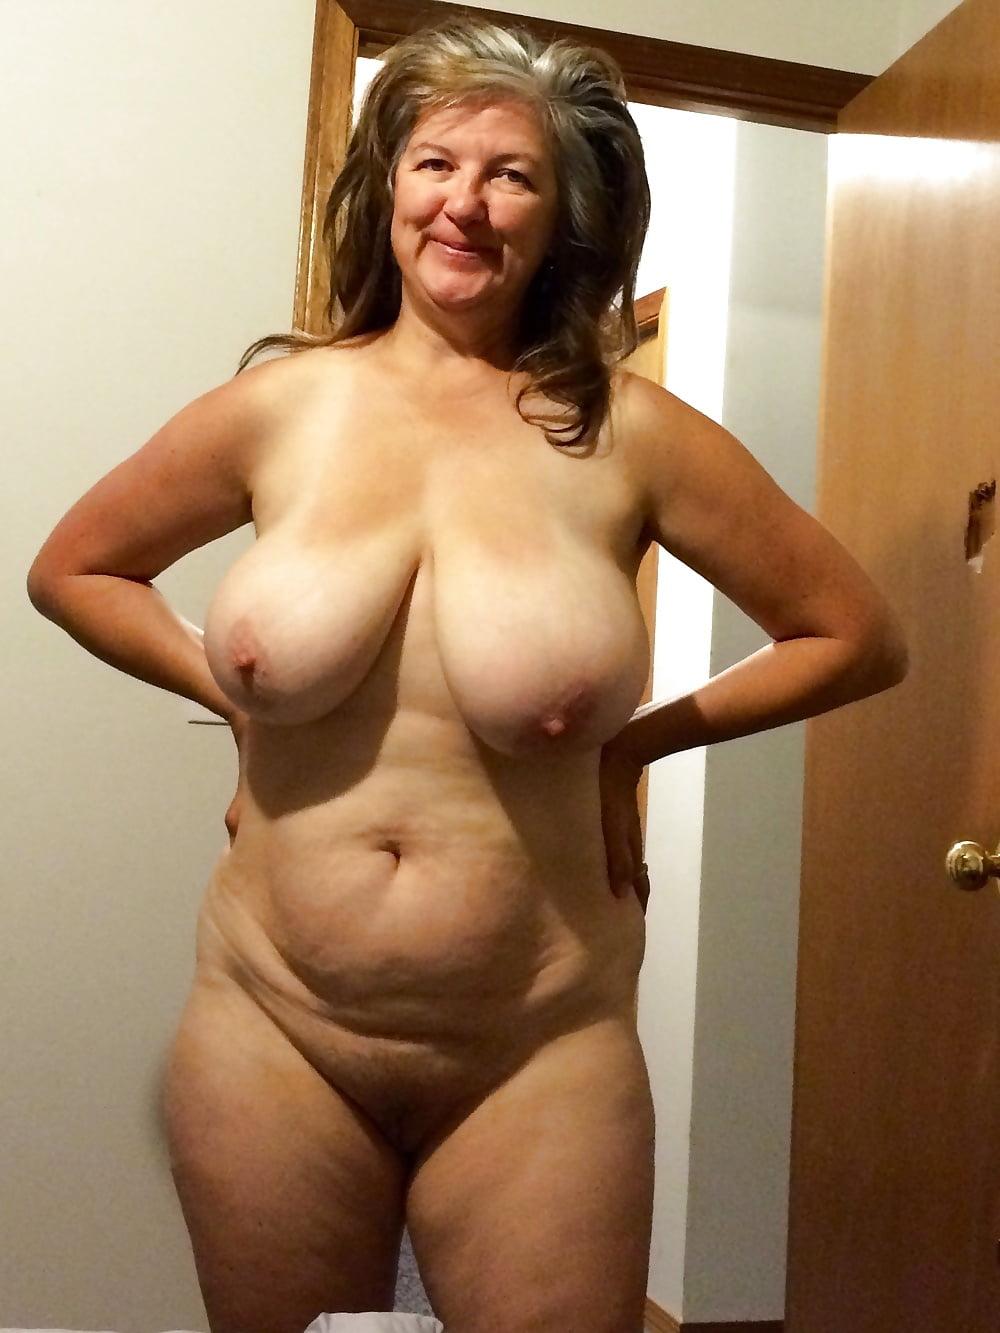 Old naked ladies tumblr-4811